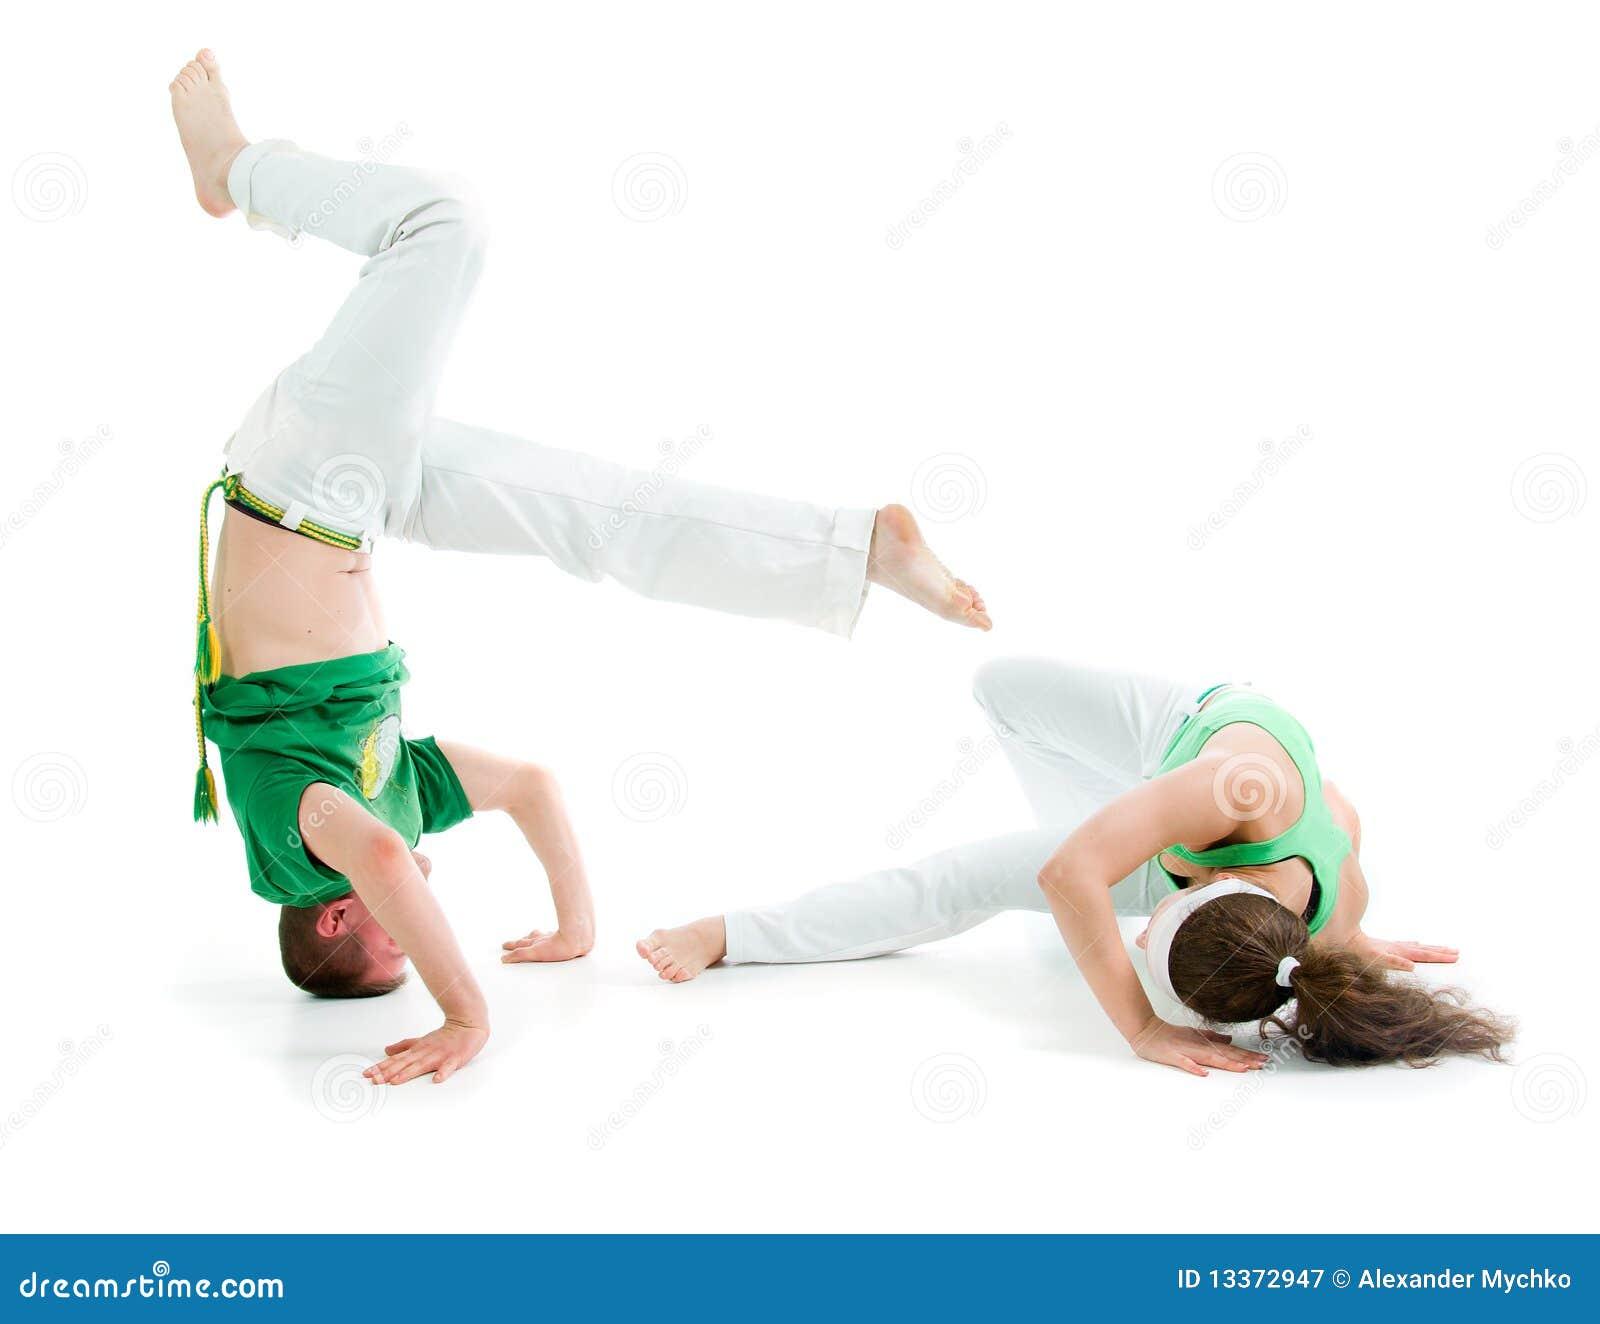 Esporte de contato. Capoeira